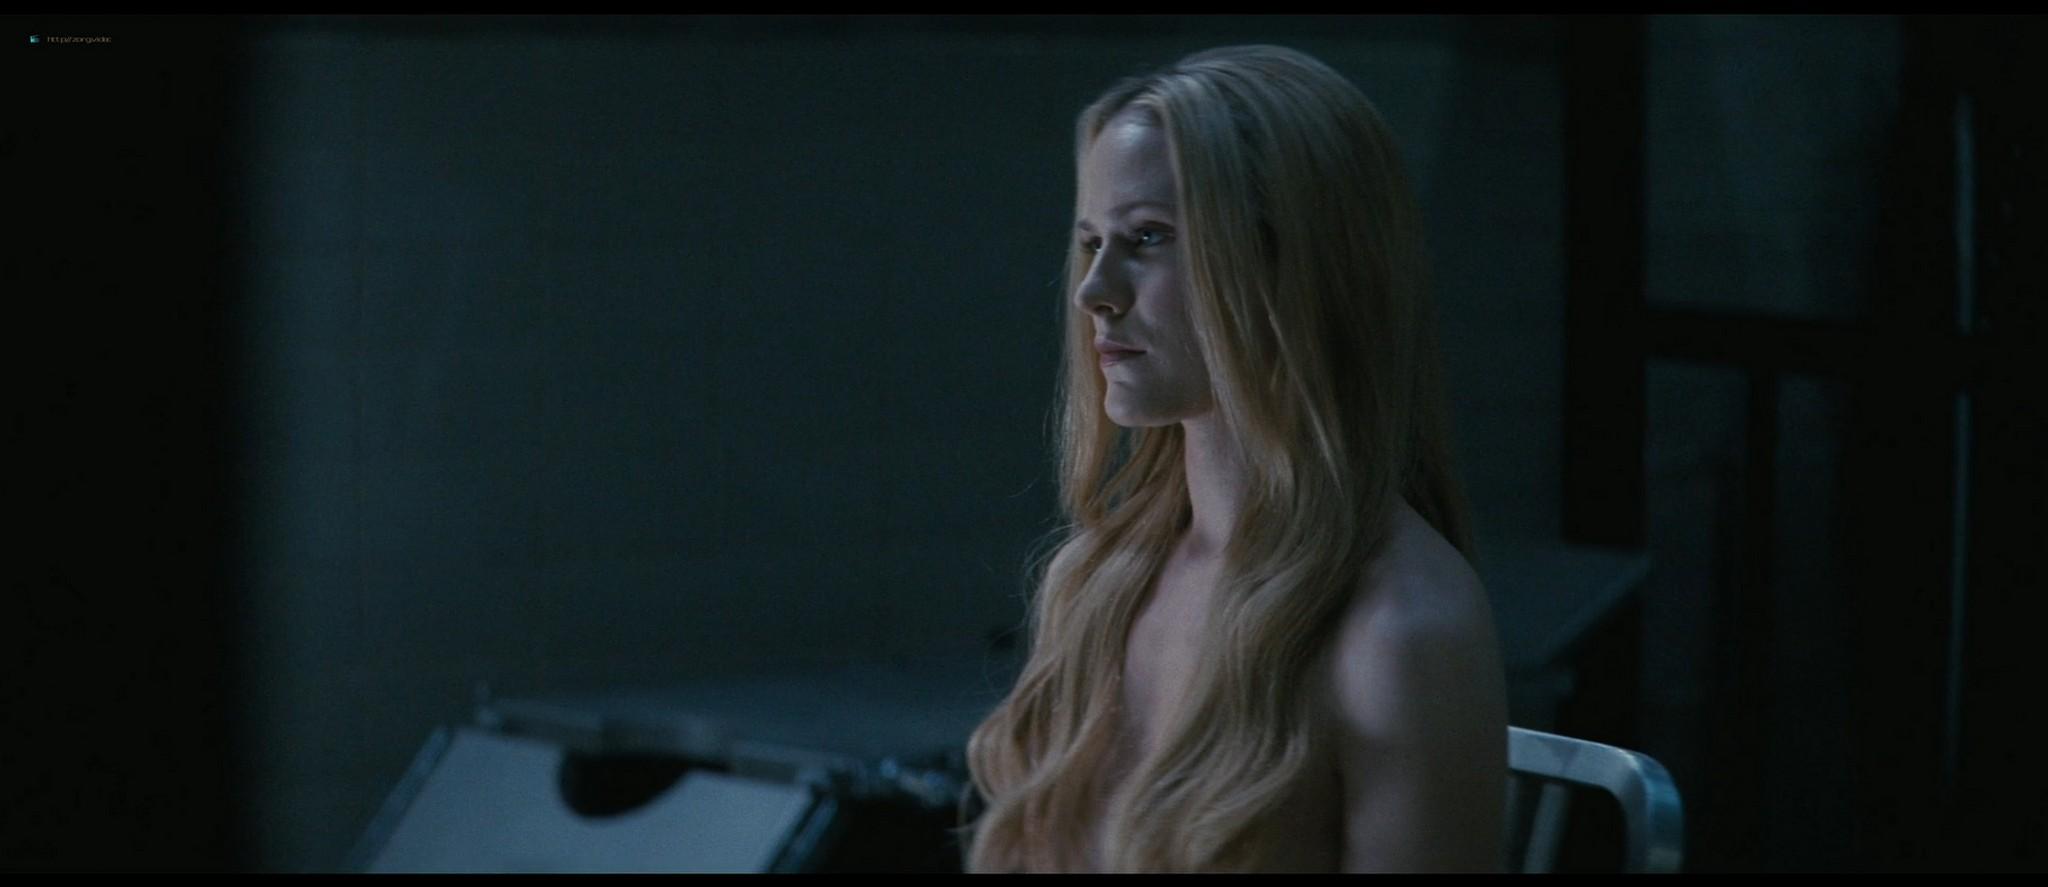 Evan Rachel Wood nude butt - Westworld (2020) s3e6 HD 1080p (7)